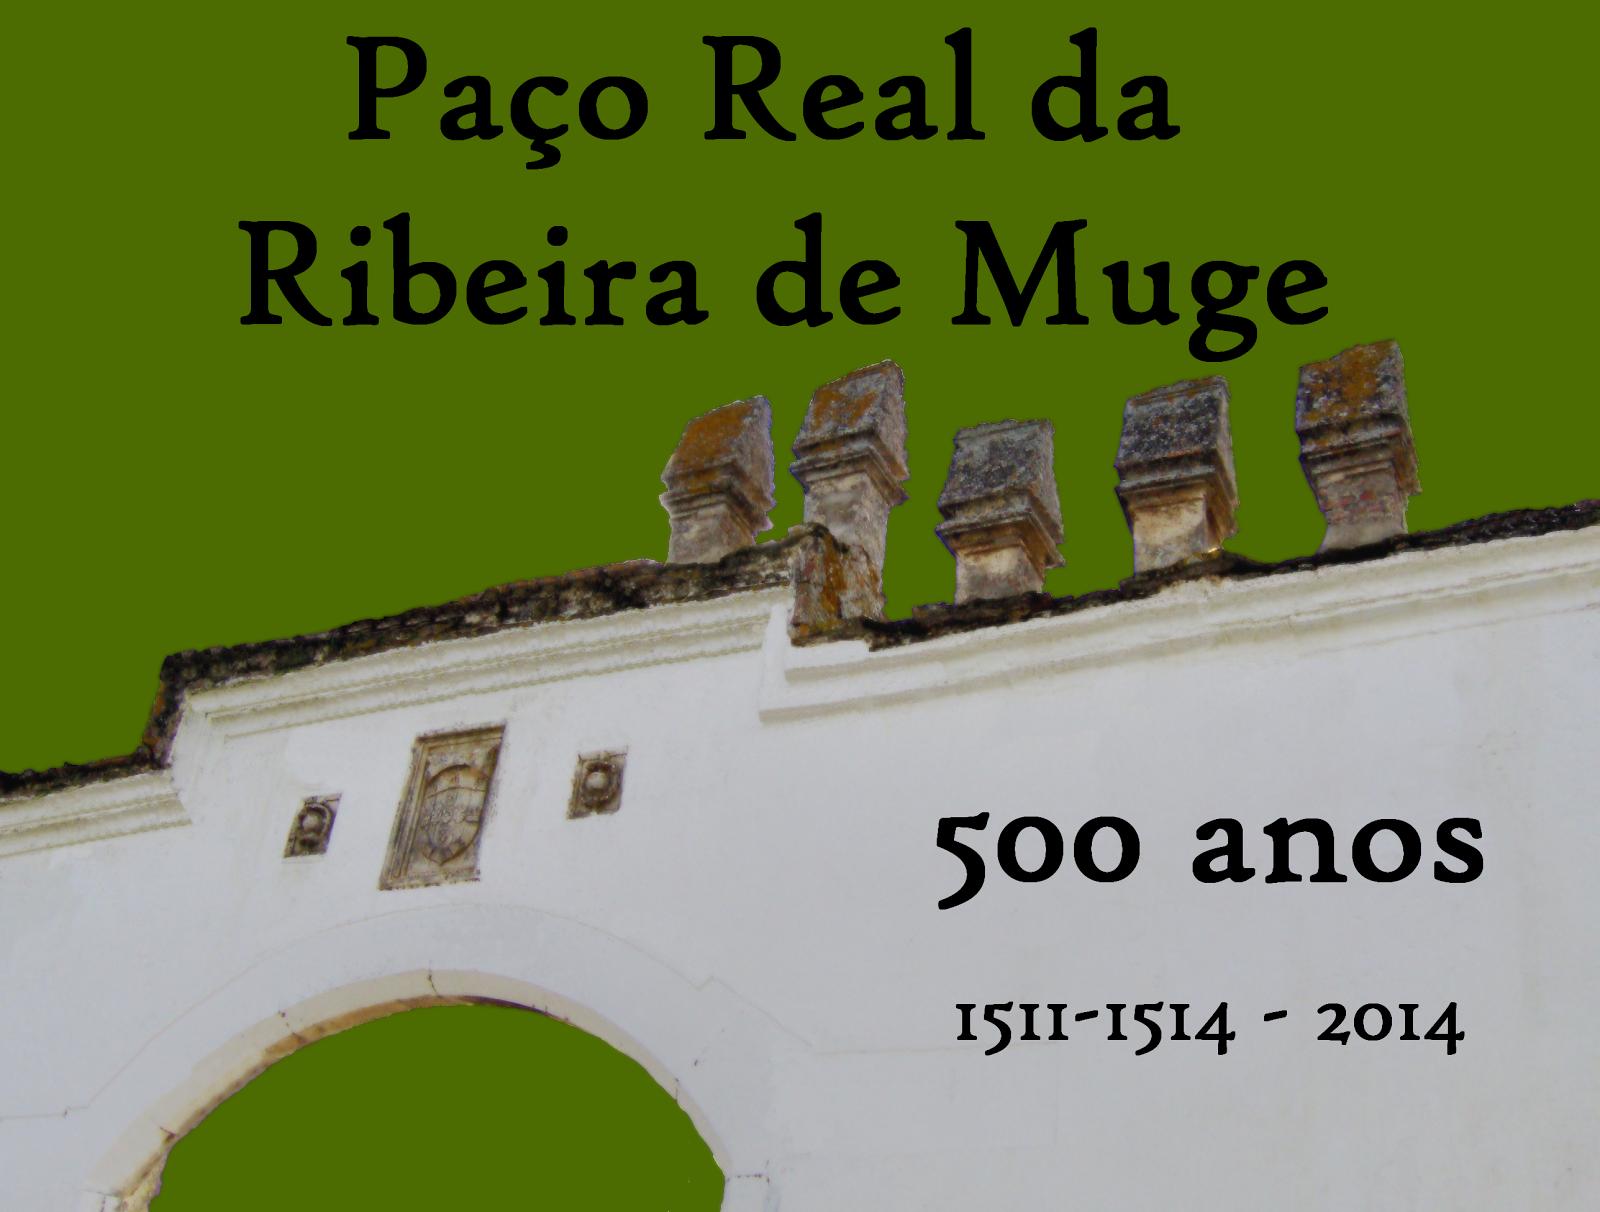 http://embuscadopatrimonio.blogspot.pt/2014/04/contemplo-estas-ruinas-seculares-restos.html#gpluscomments